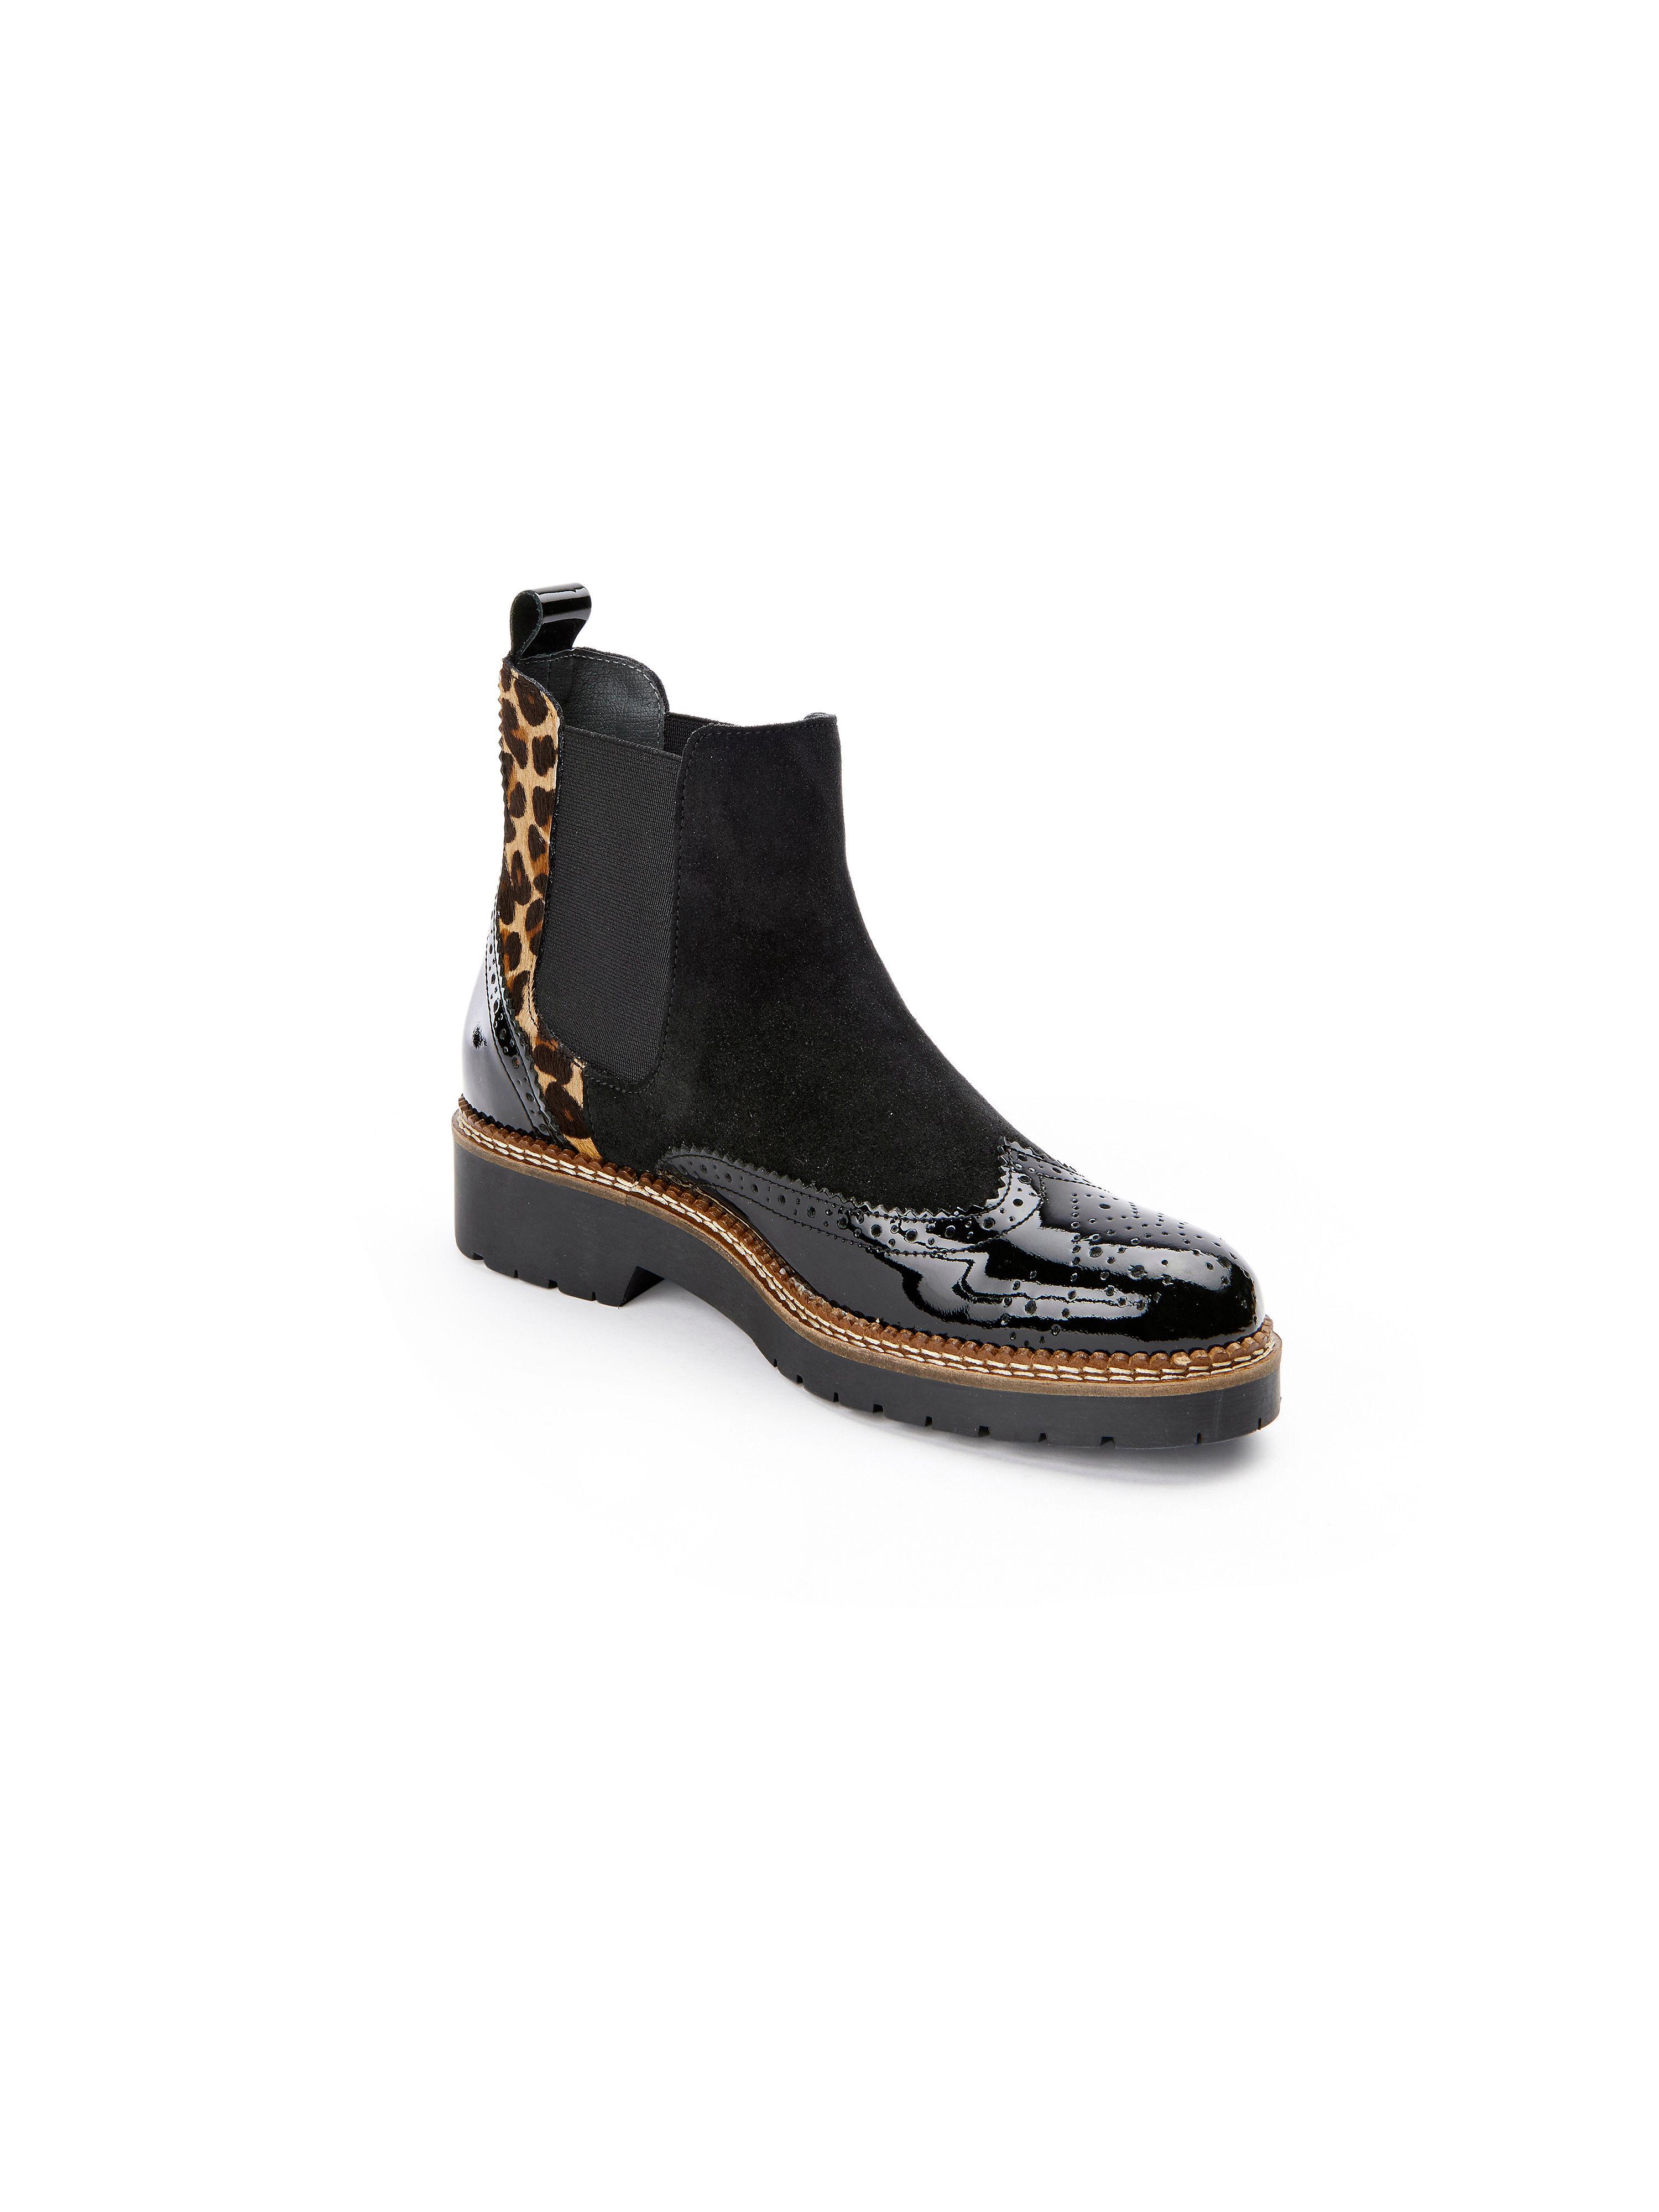 Scarpio - Chelsea-Boot - Schuhe Schwarz/Leo Gute Qualität beliebte Schuhe - b6a84f